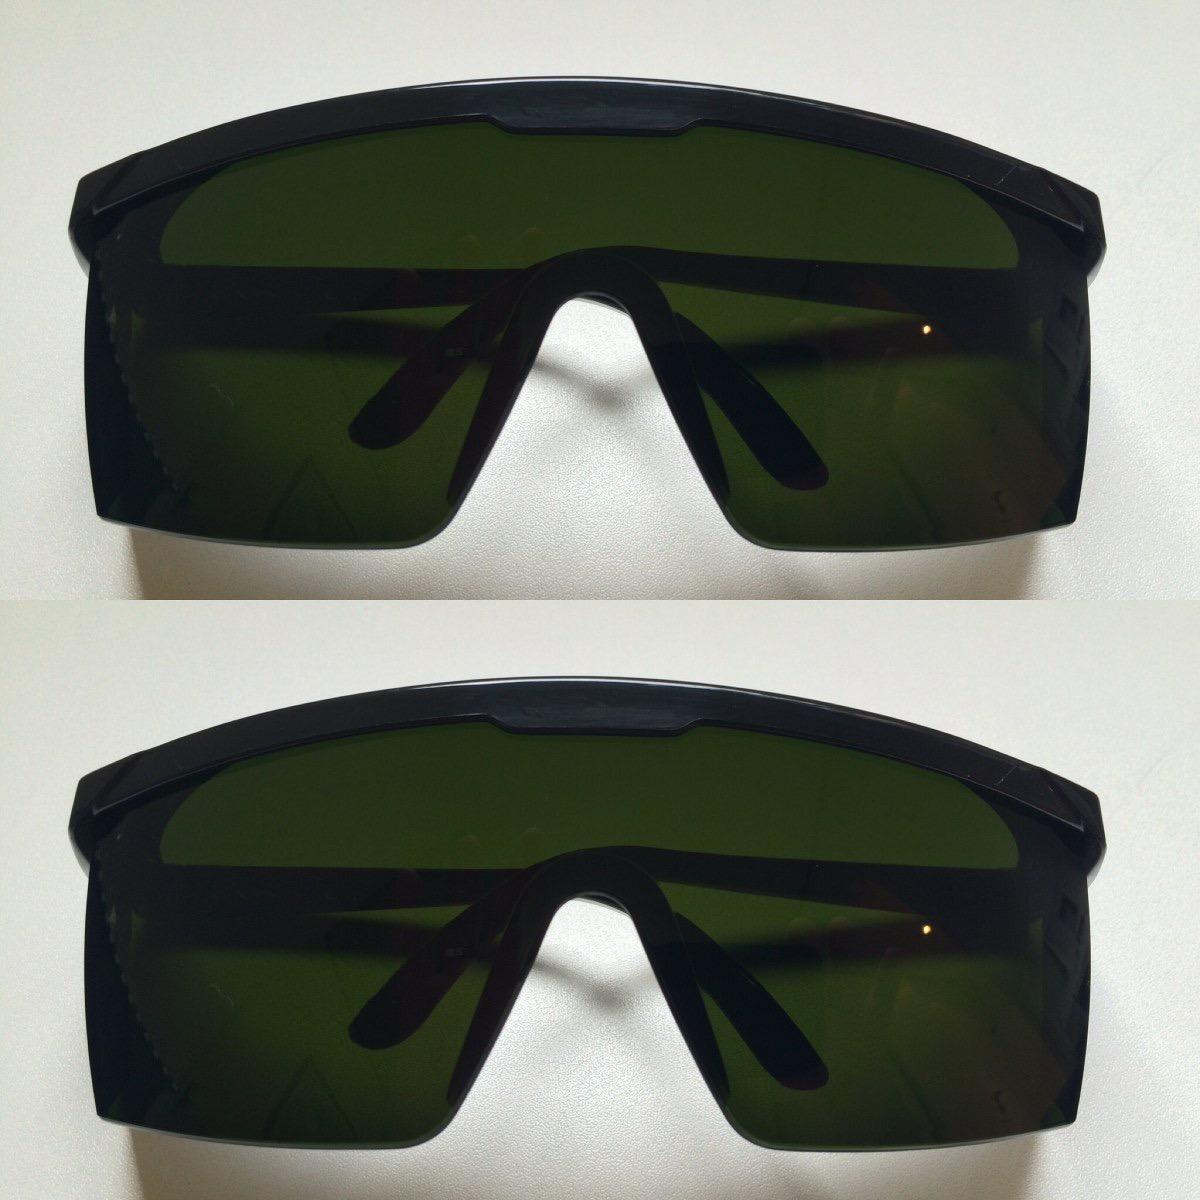 oculos de proteçao contra raio laser e luz pulsada ipl. Carregando zoom. e1d56c02ec